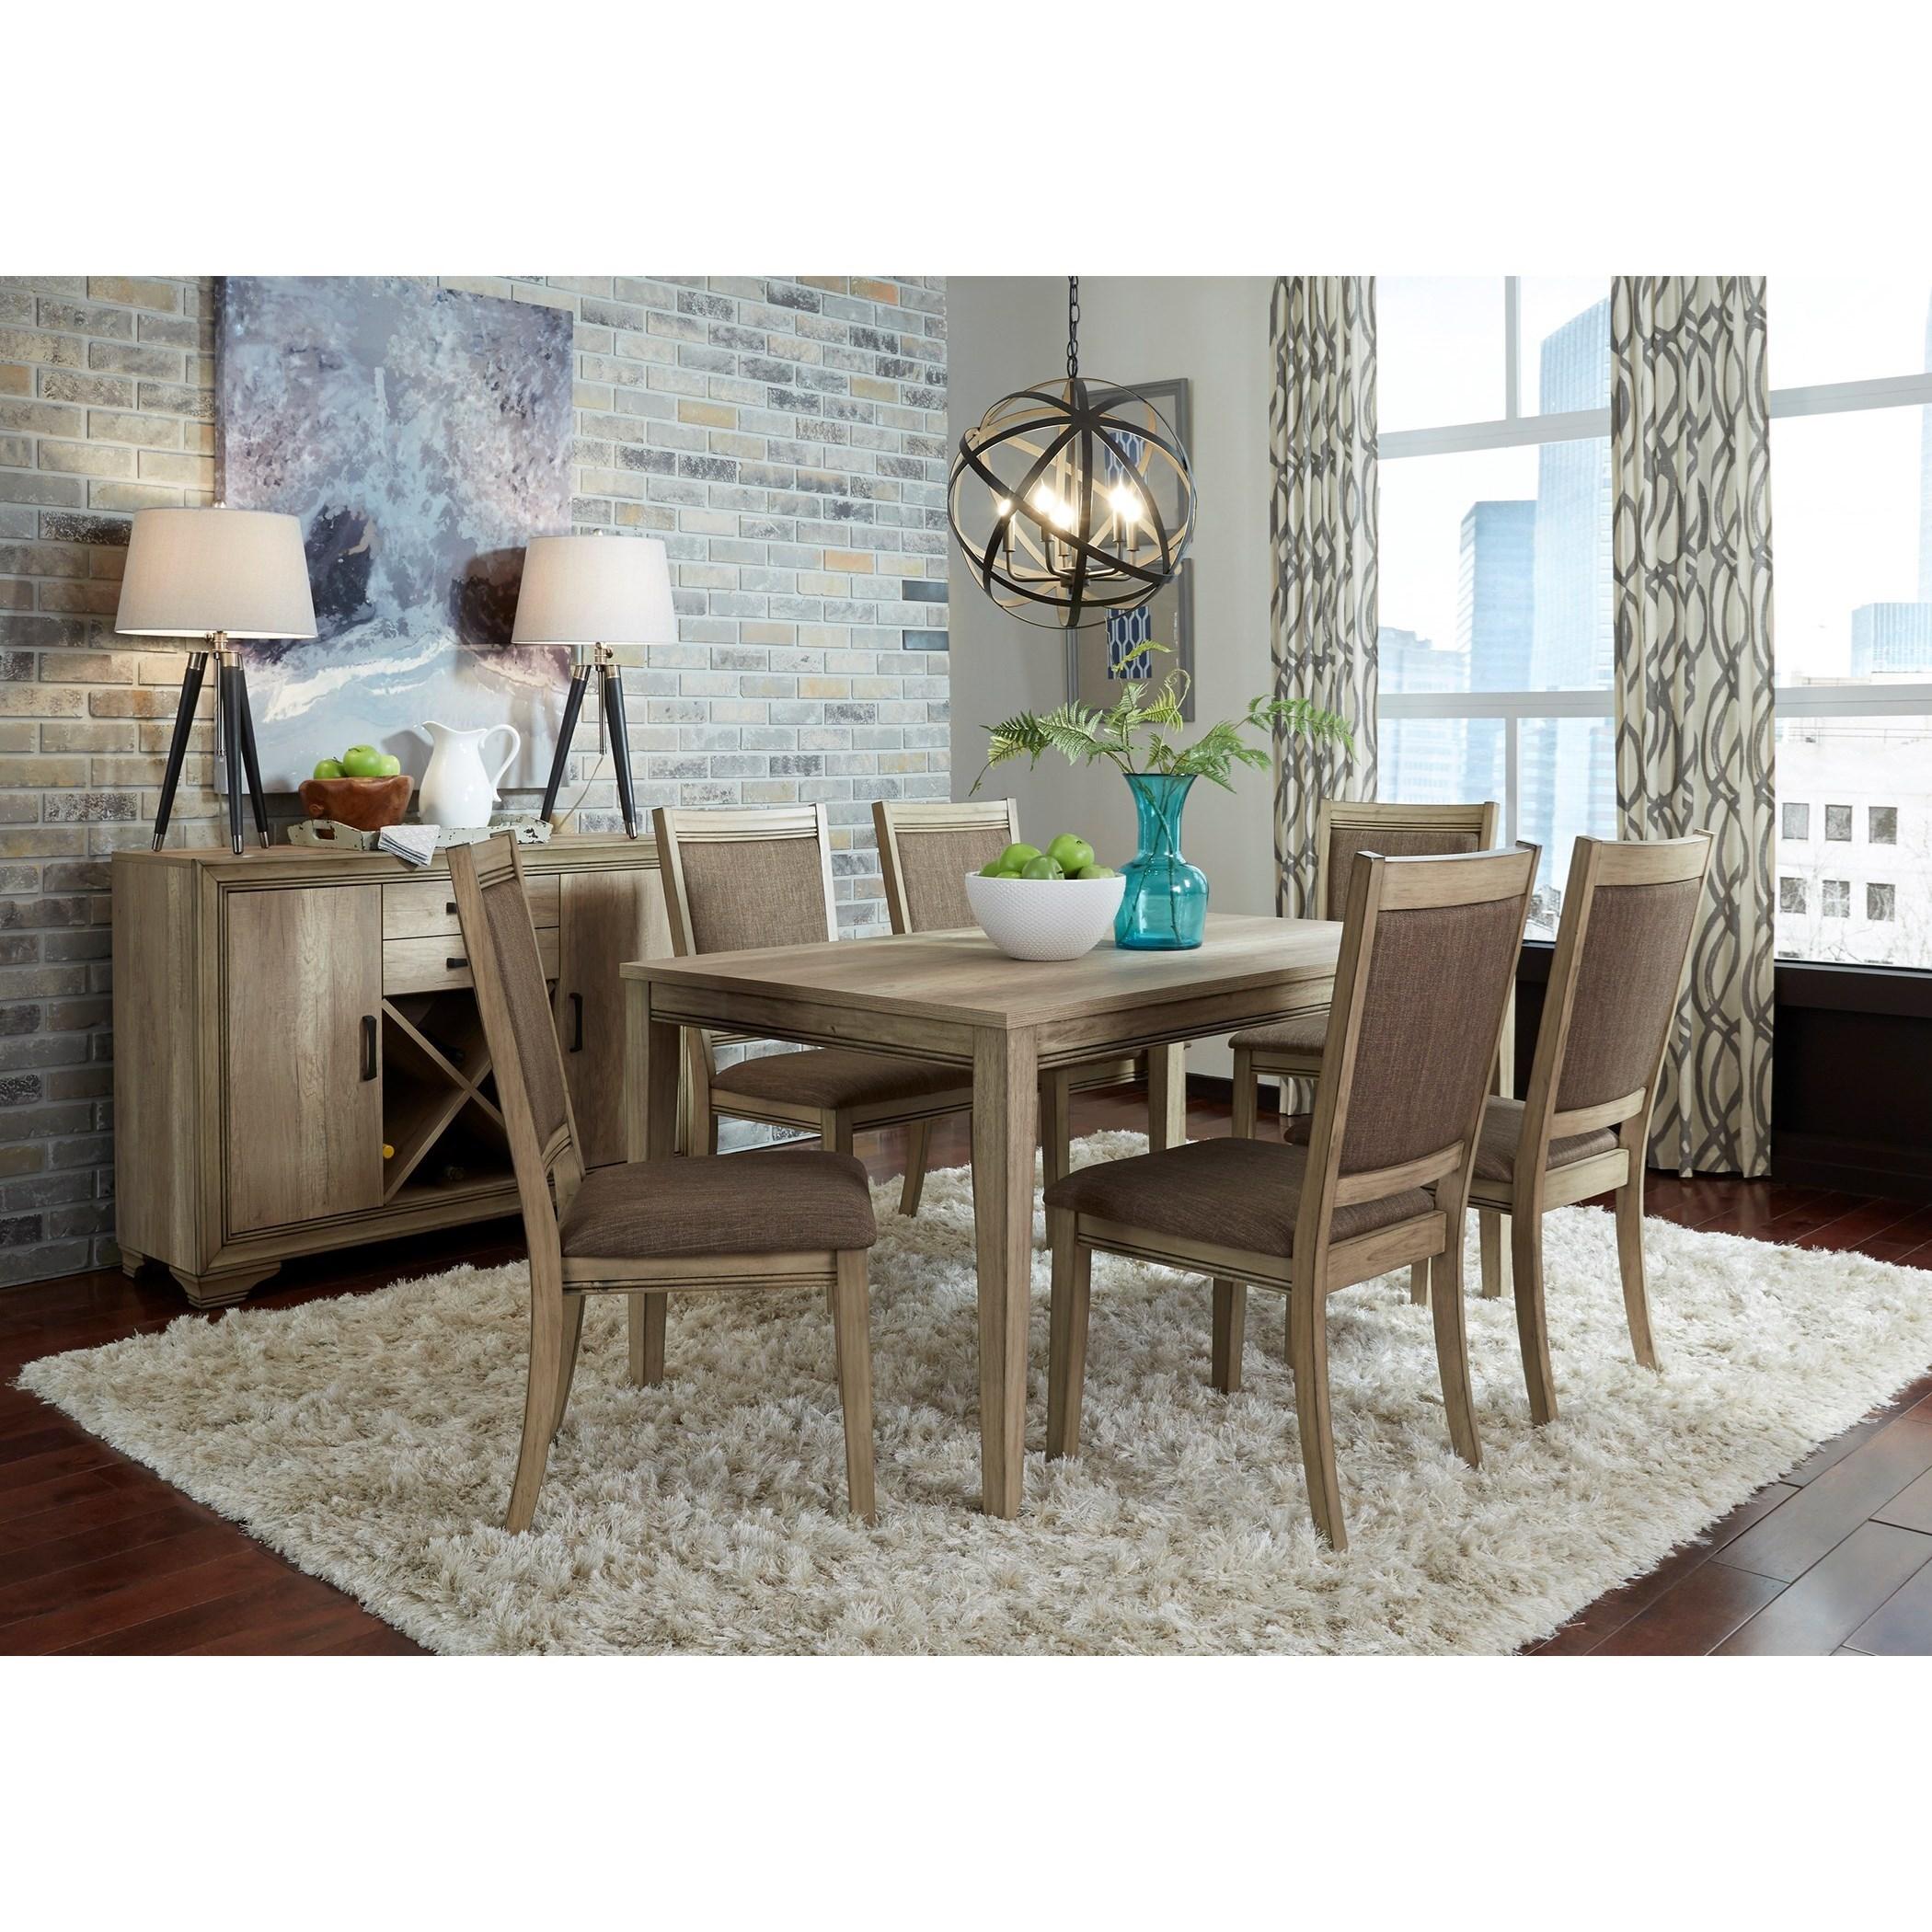 Sun Valley Opt 7 Piece Rectangular Table Set  by Liberty Furniture at Standard Furniture